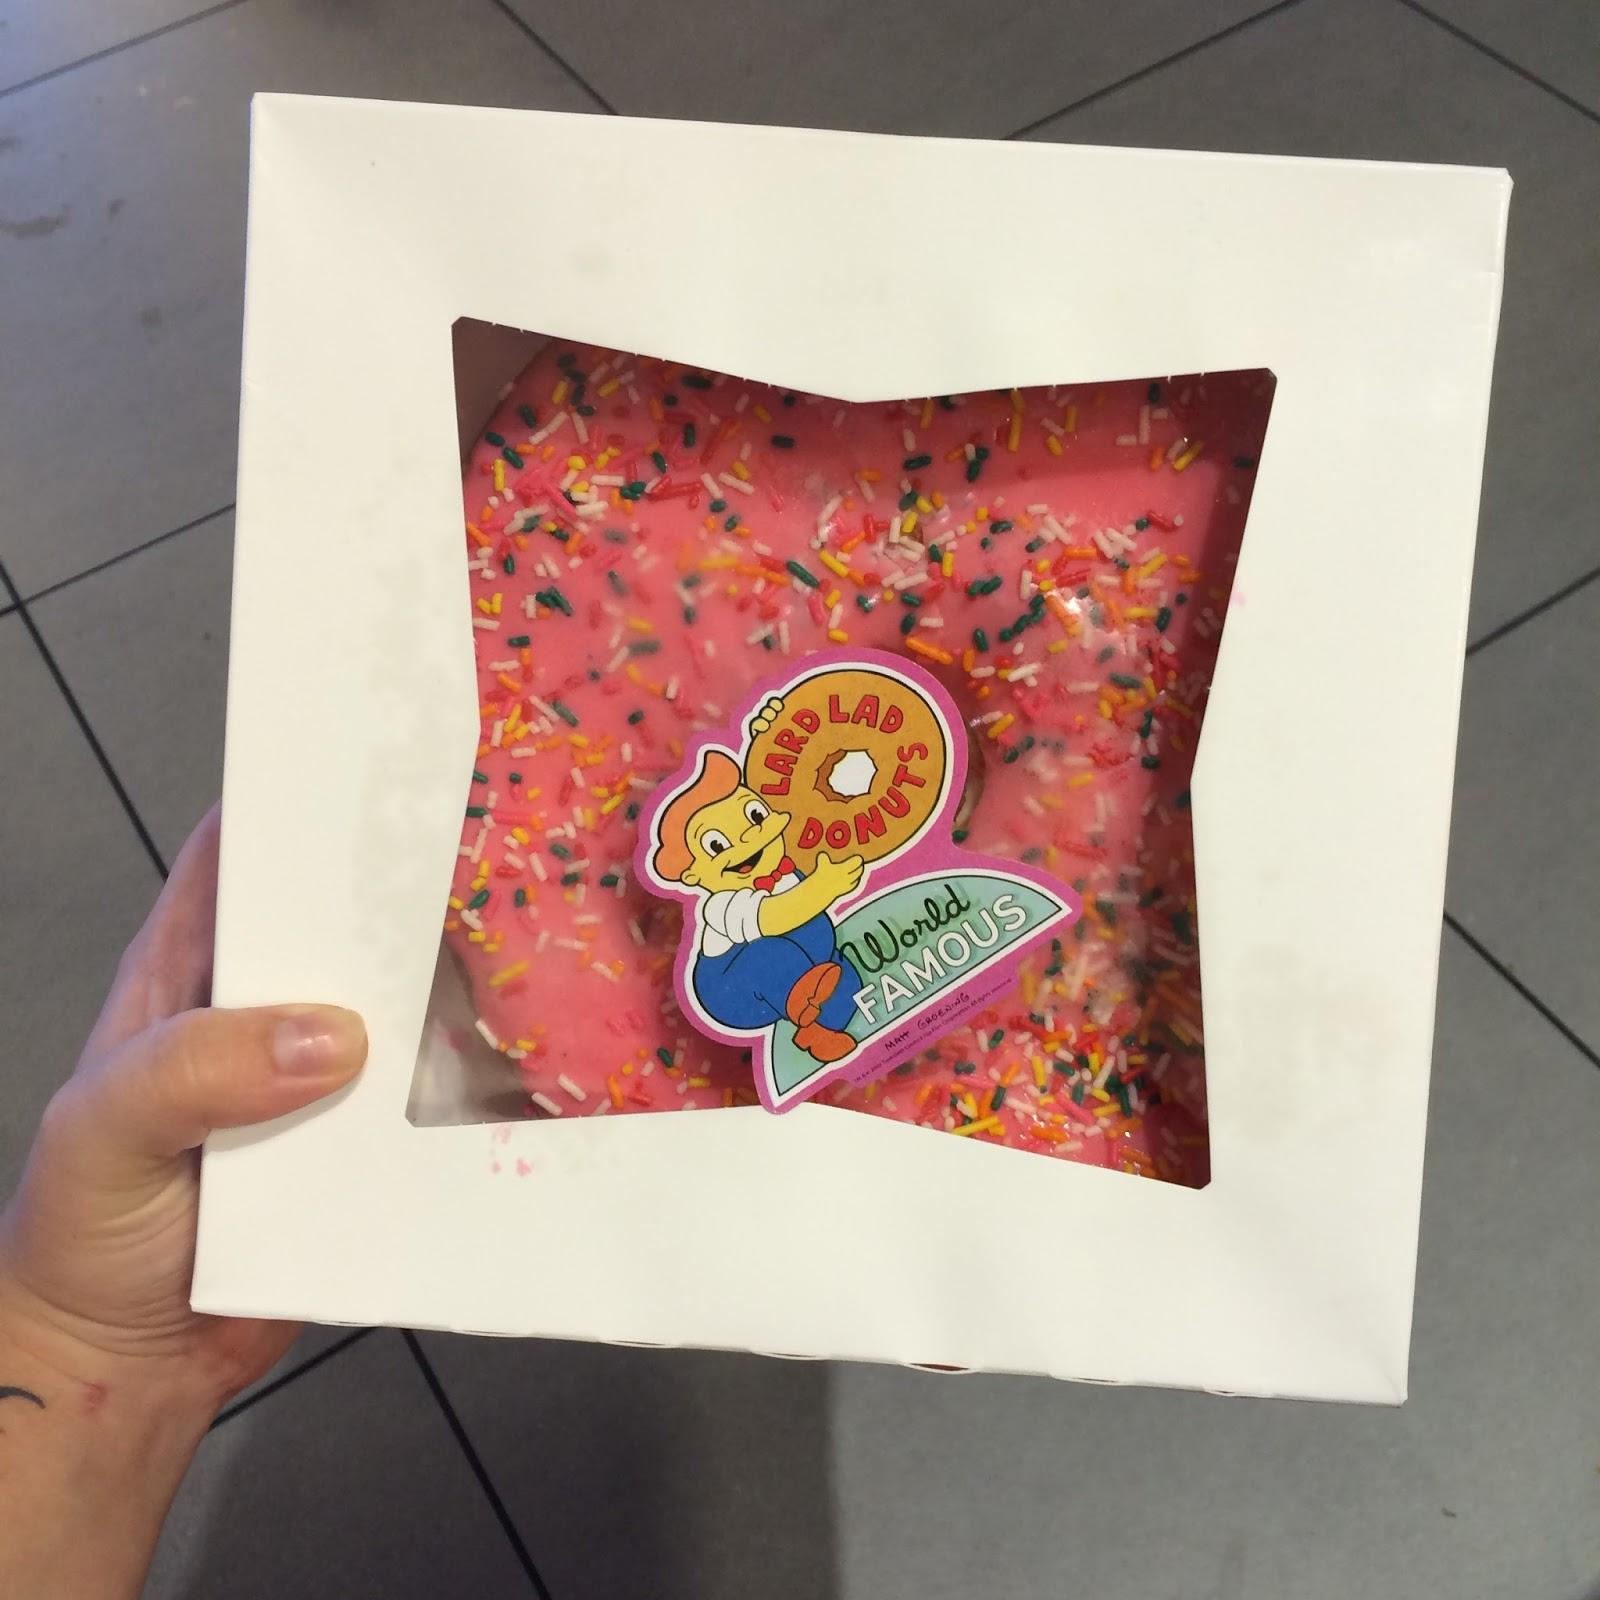 Lard Lad Donuts, Orlando